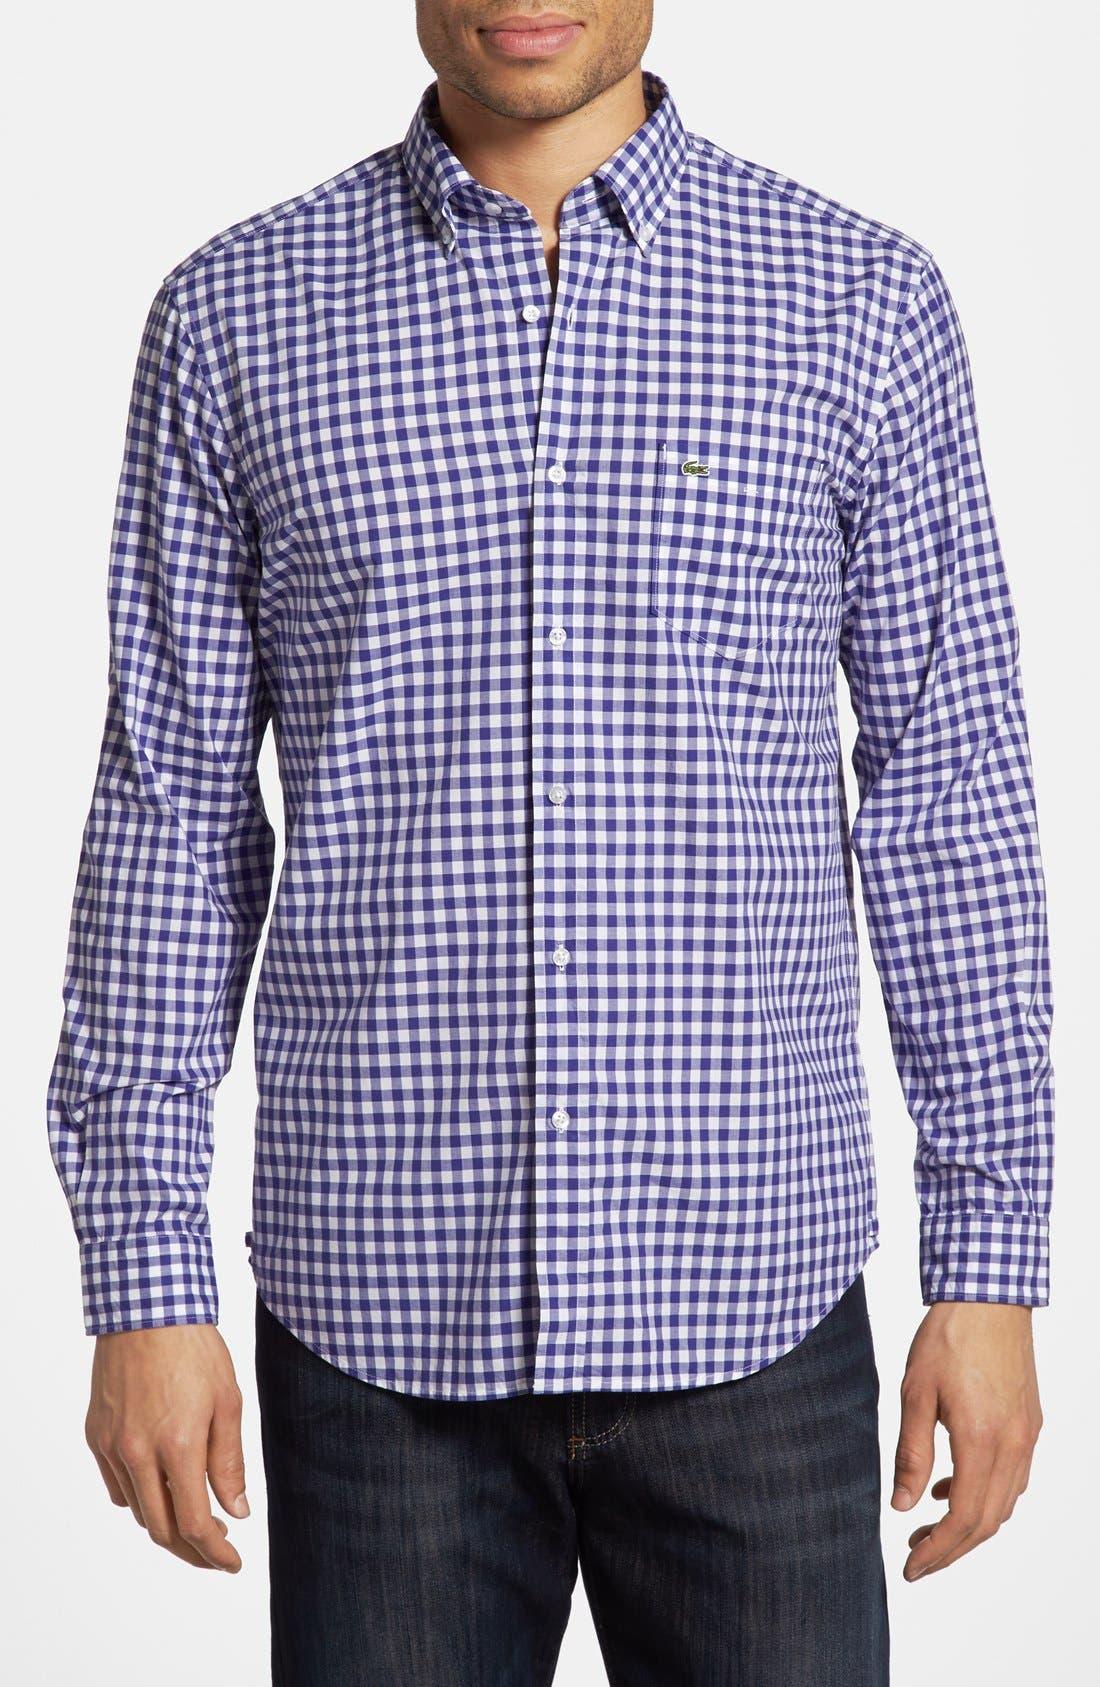 Alternate Image 1 Selected - Lacoste Gingham Sport Shirt